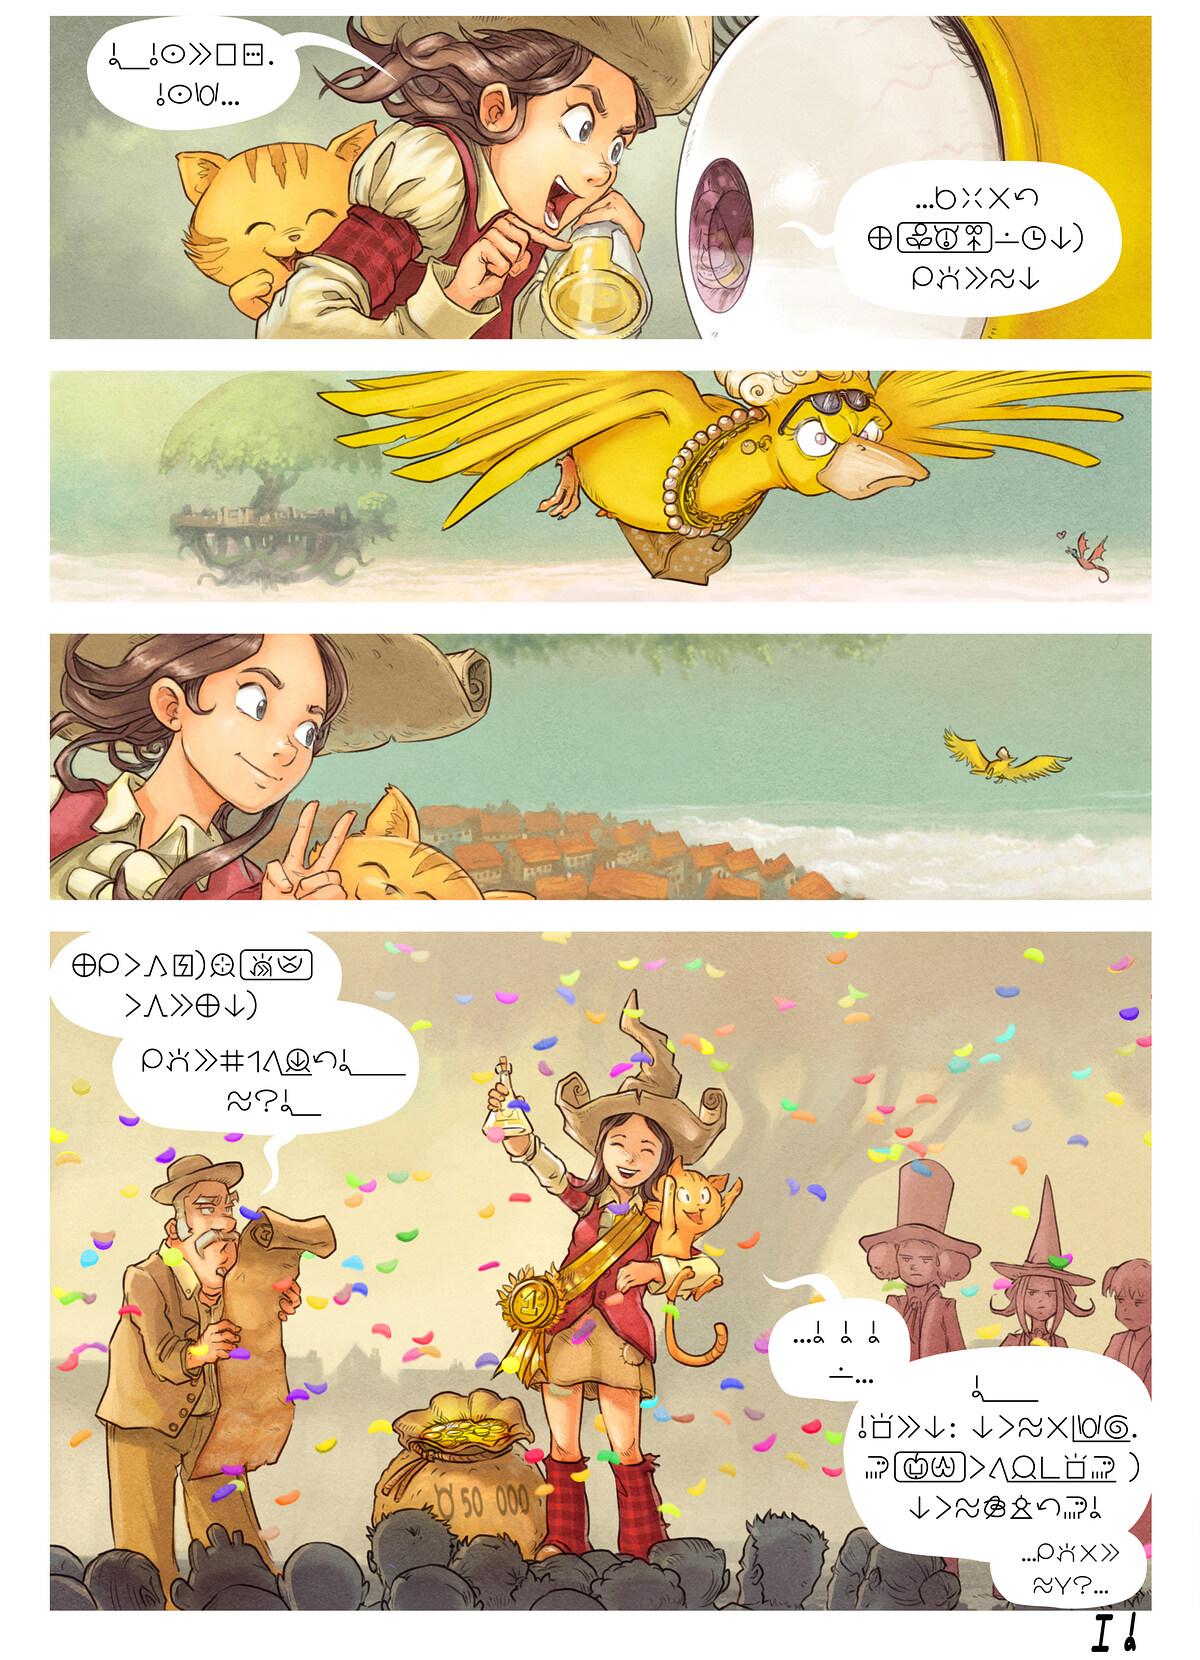 lipu nanpa luka wan: utala pi+__pali__telo, lipu lili nanpa 9